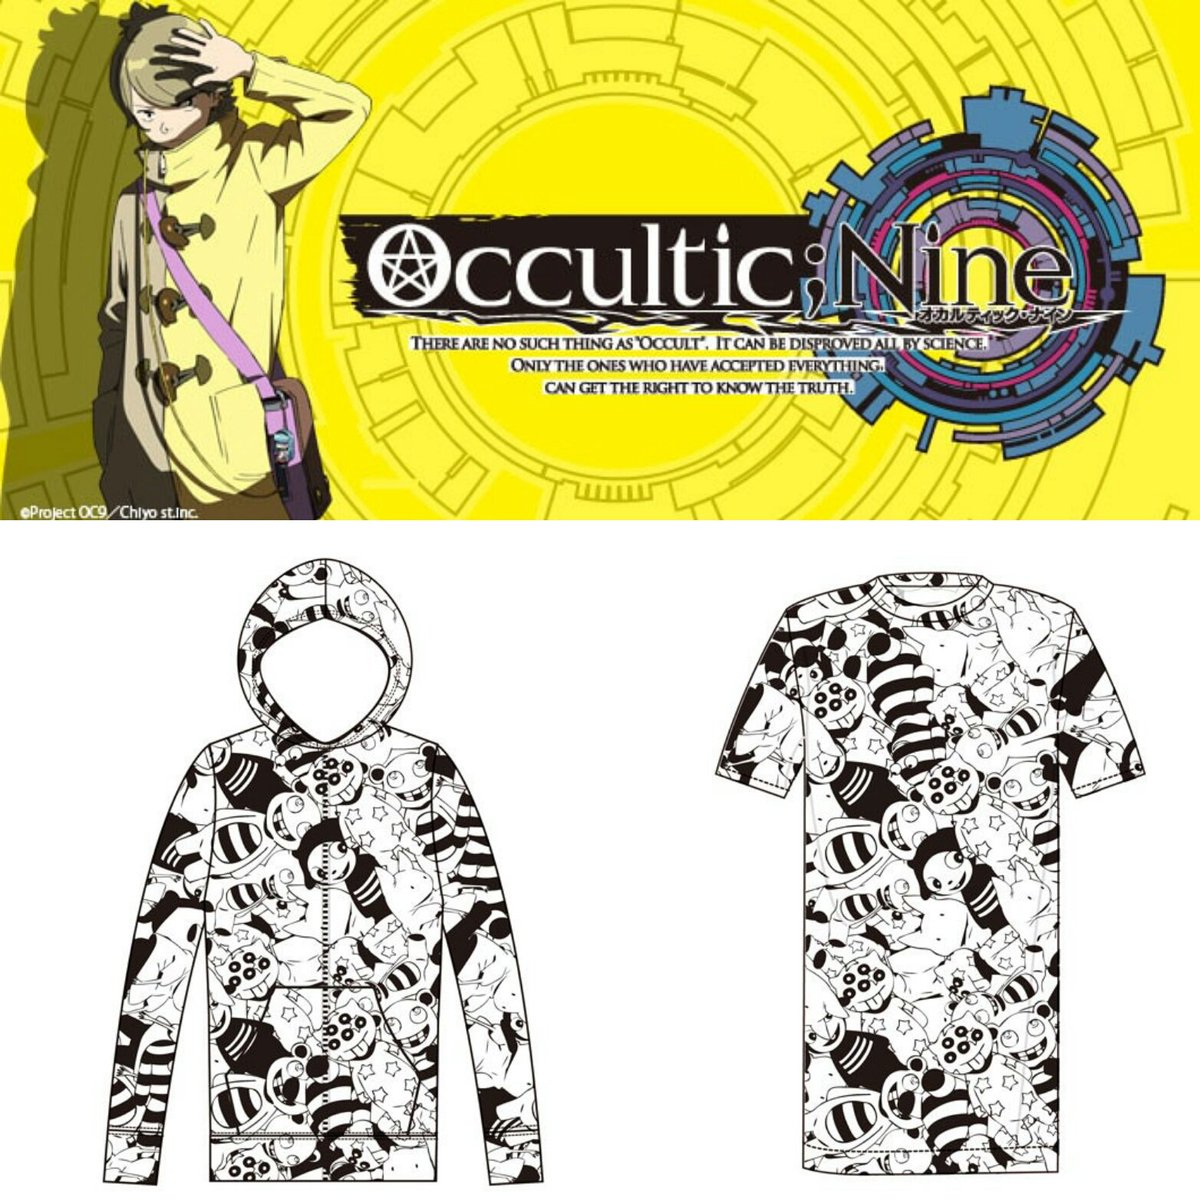 『Occultic;Nine』、『CHAOS;CHILD』コラボ6月下旬~7月上旬頃発売決定!!Web予約開始!#チヨス